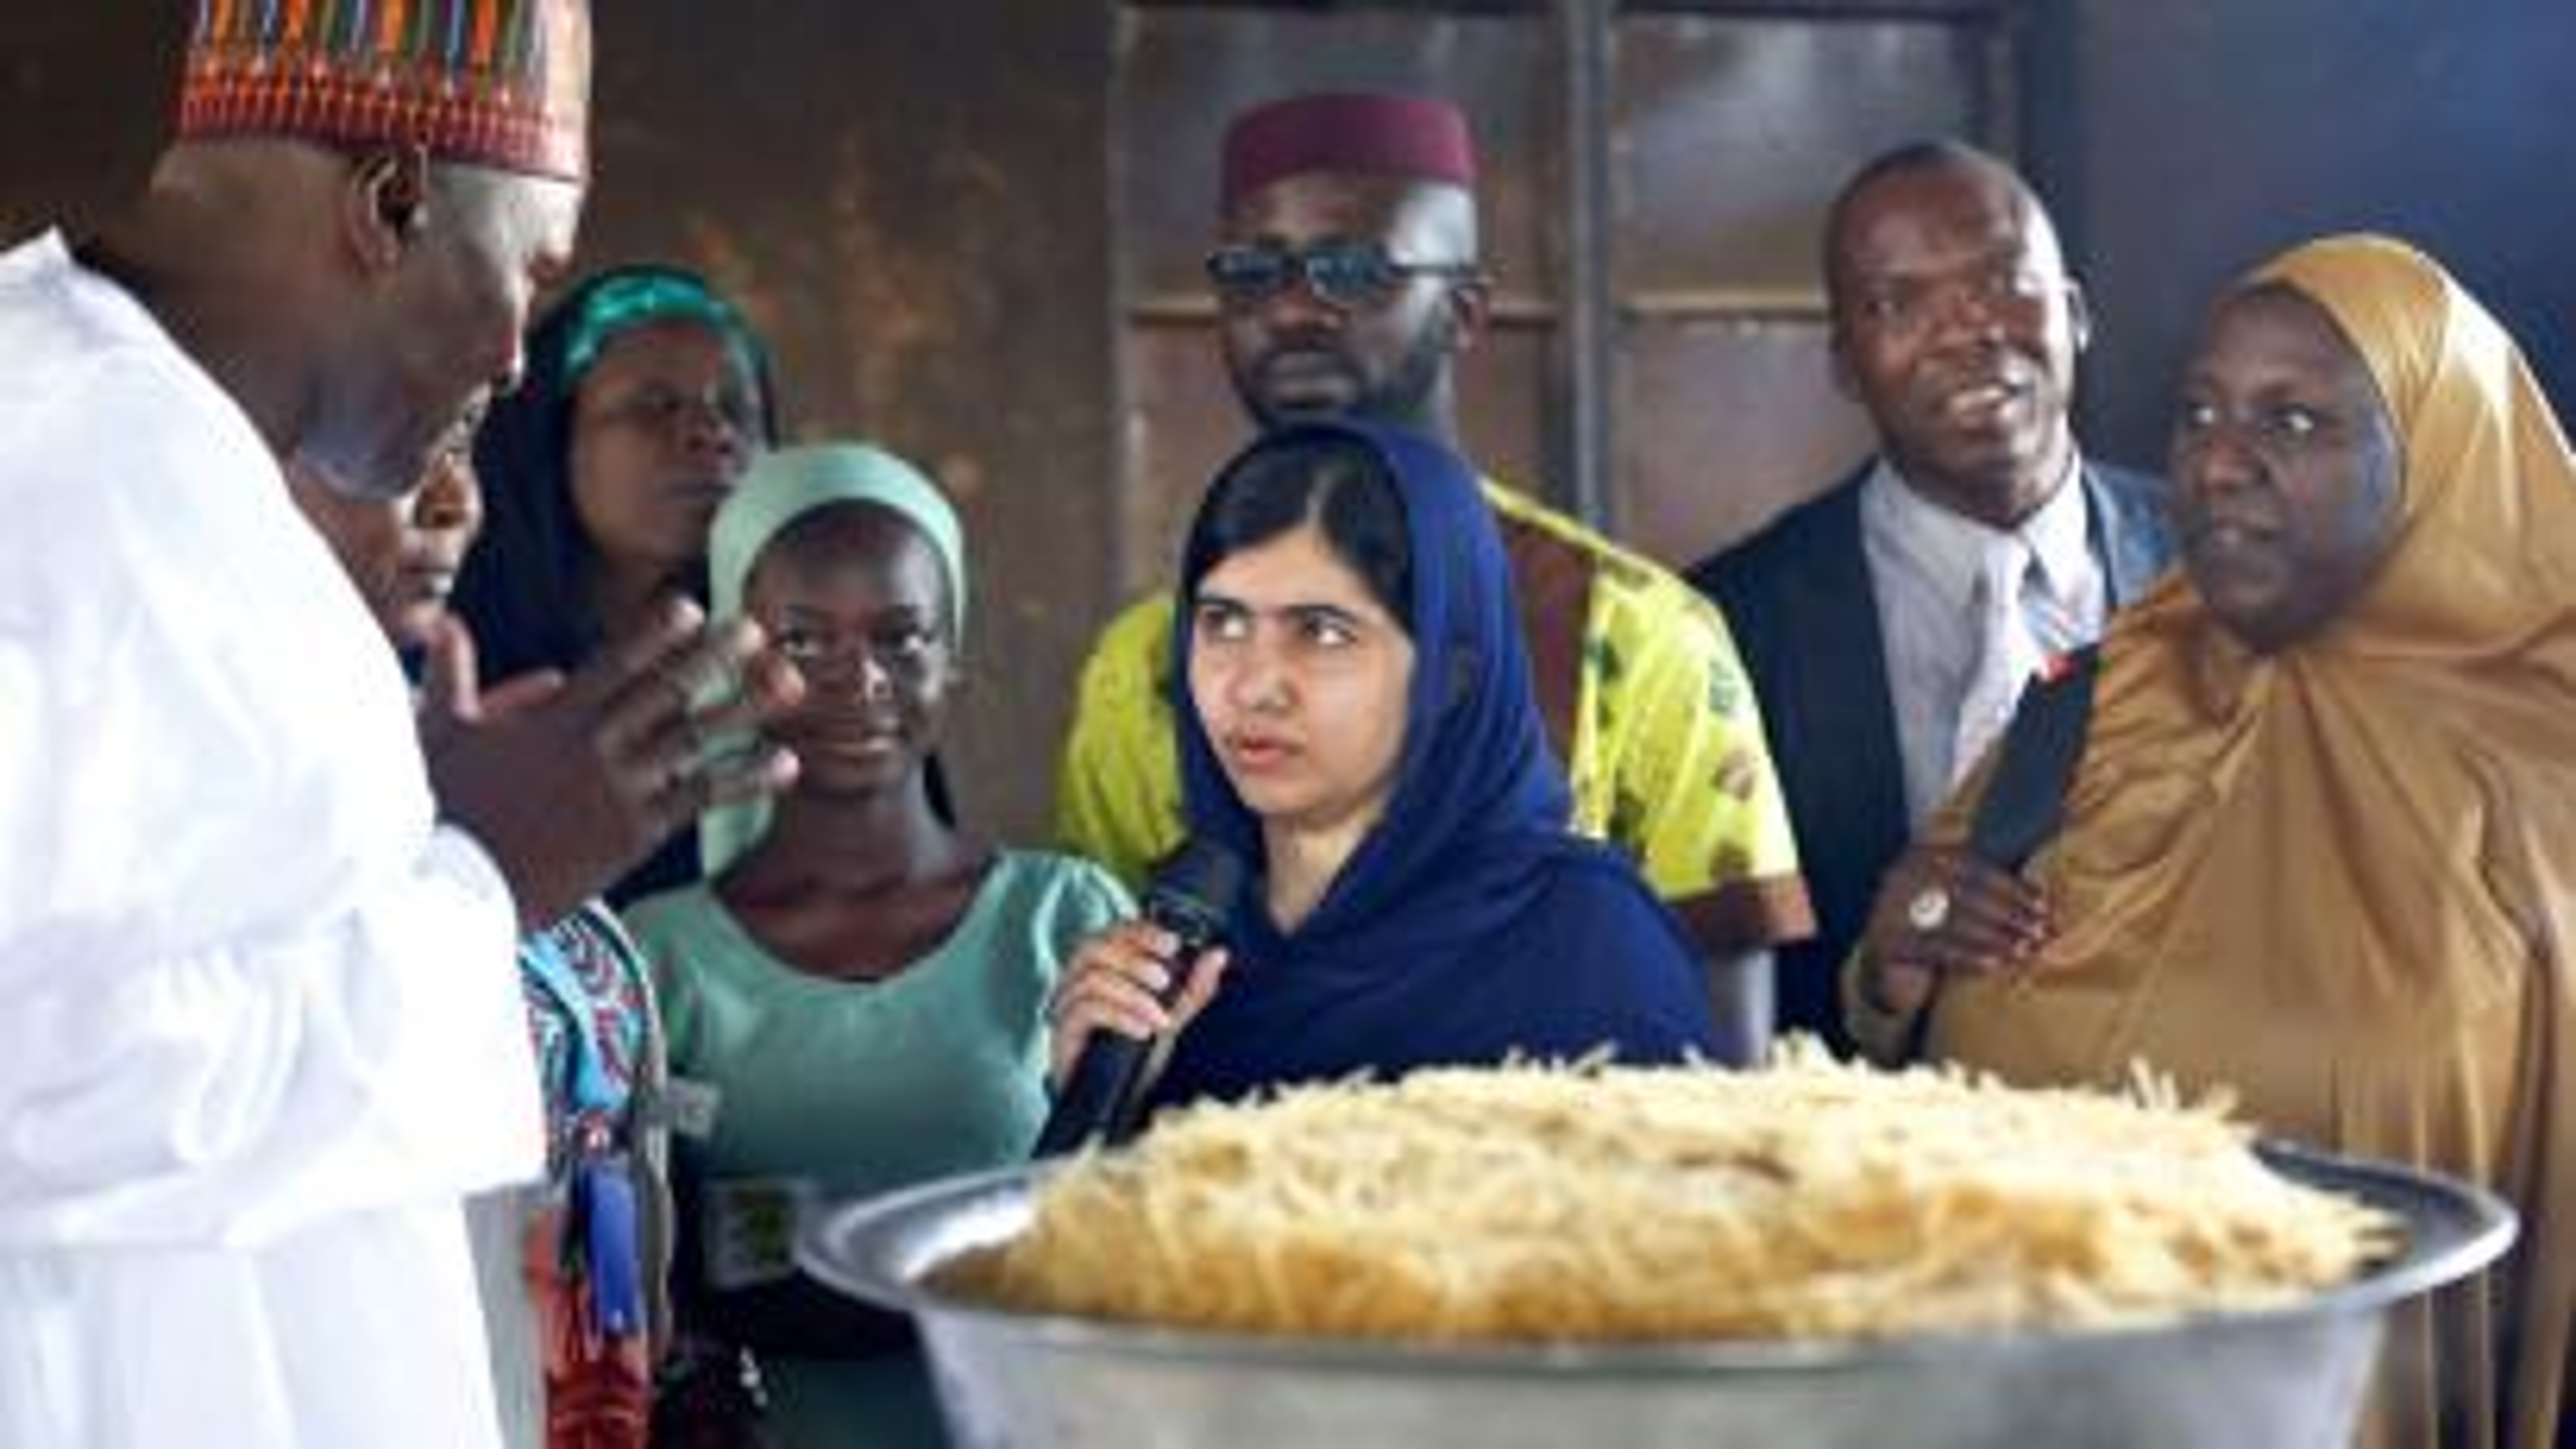 Nobel laureate Malala Yousafzai seen at the kitchen of Yerwa Girls school in Maiduguri, Nigeria